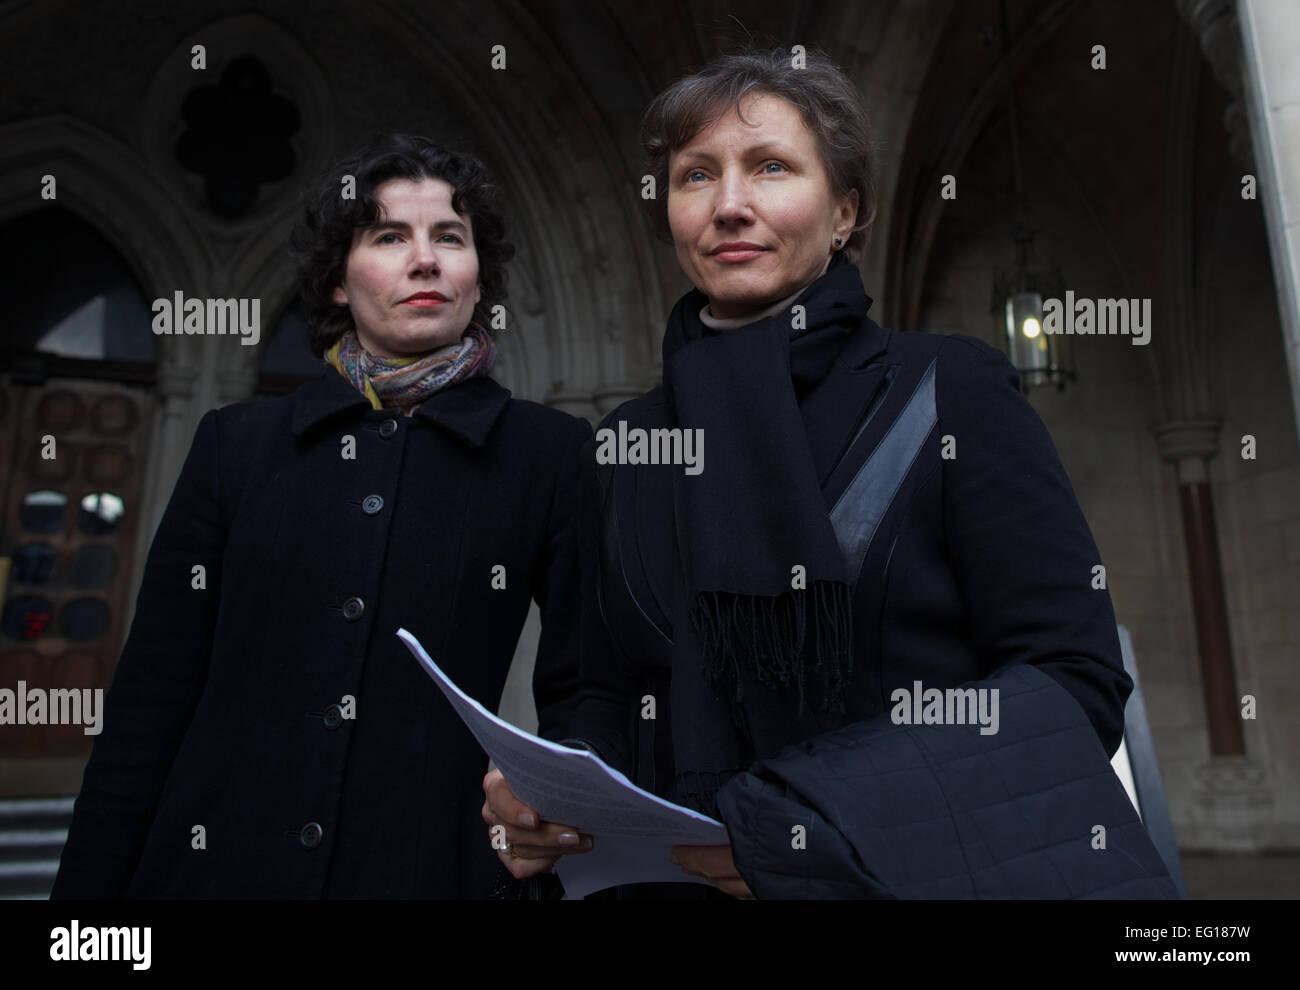 UNITED KINGDOM, London : Russian widow of the former KGB spy Alexander Litvinenko, Marina (R) is photographed leaving - Stock Image